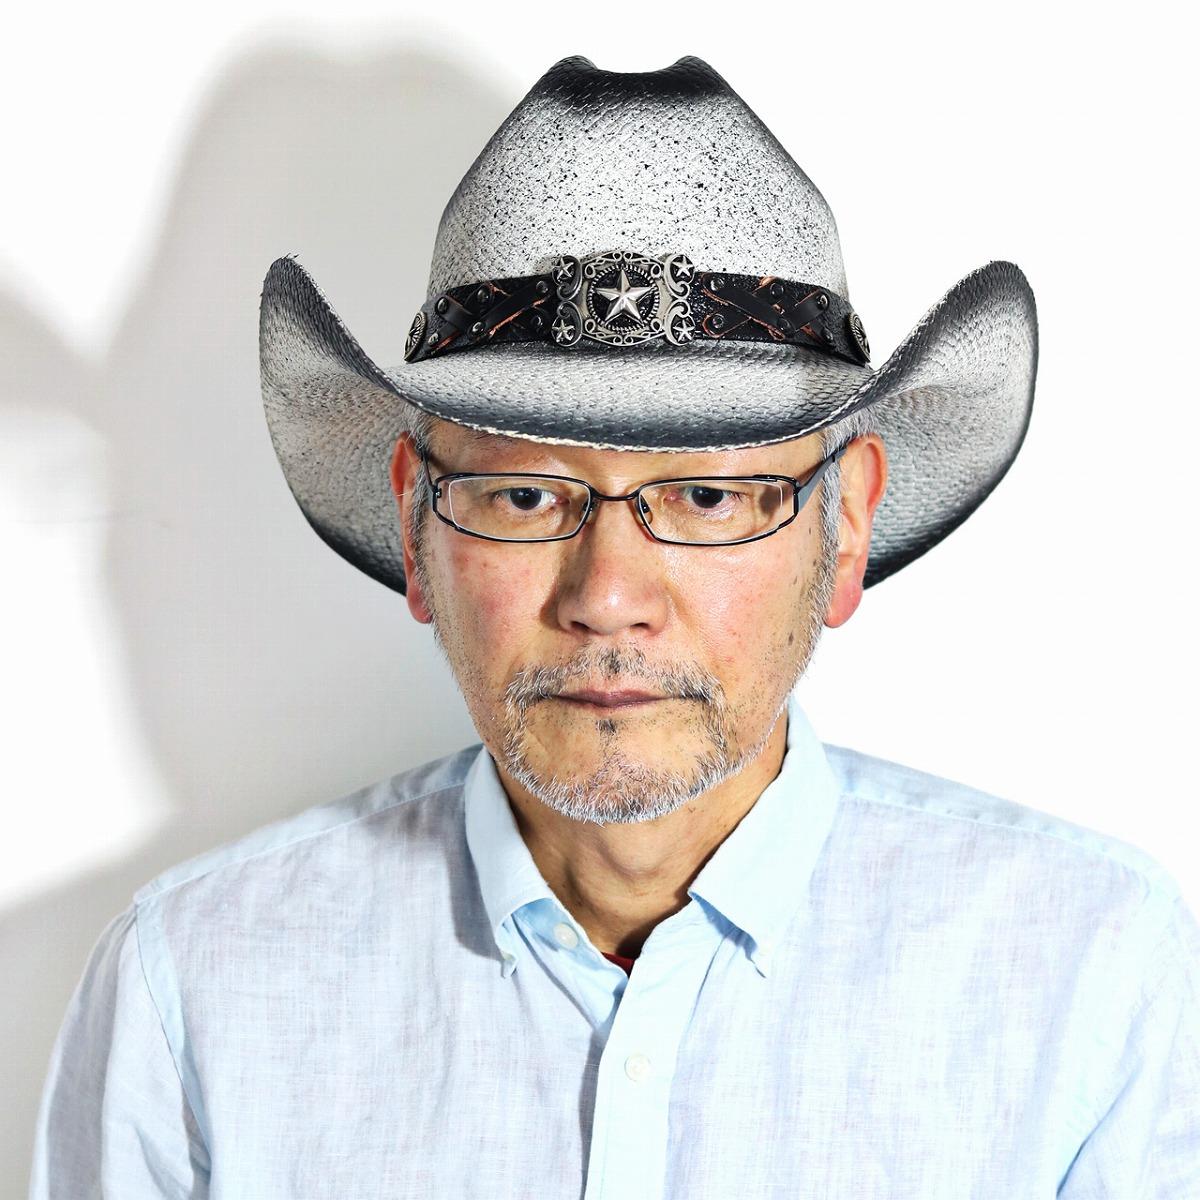 Brach s theine. A brand California Hat Company Inc. Panama hat western hat  California Hat Company Inc. California hat high quality ten gallon ... 3bd462c1ce13